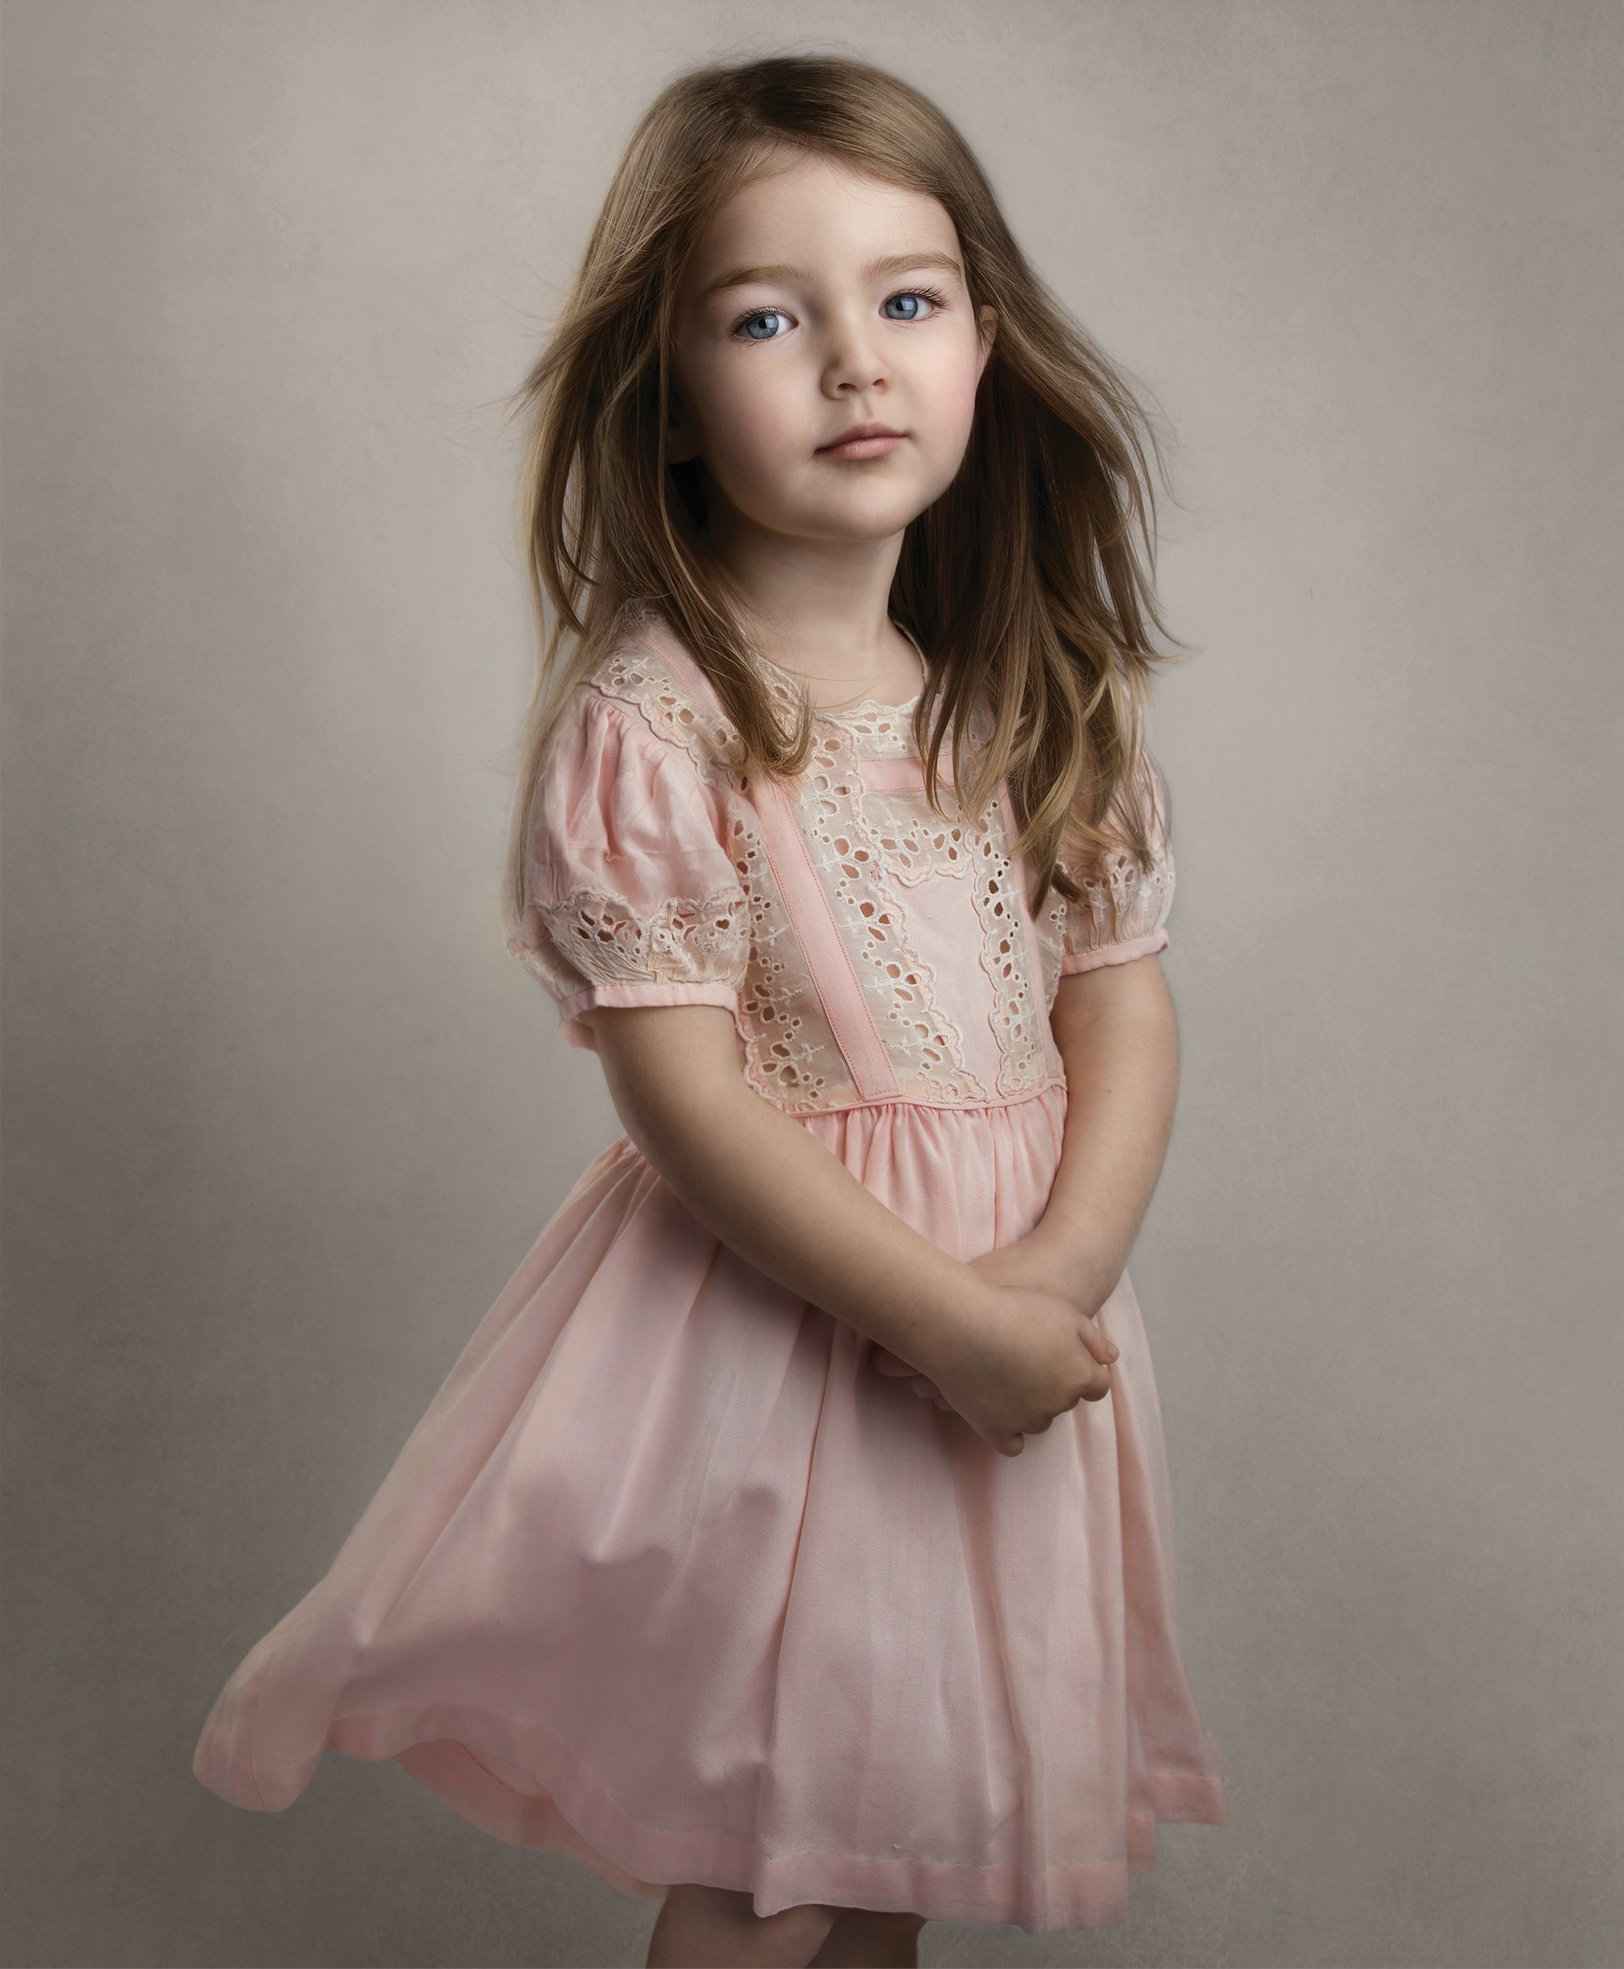 FIne-Art-Child-Portraits-6.jpg